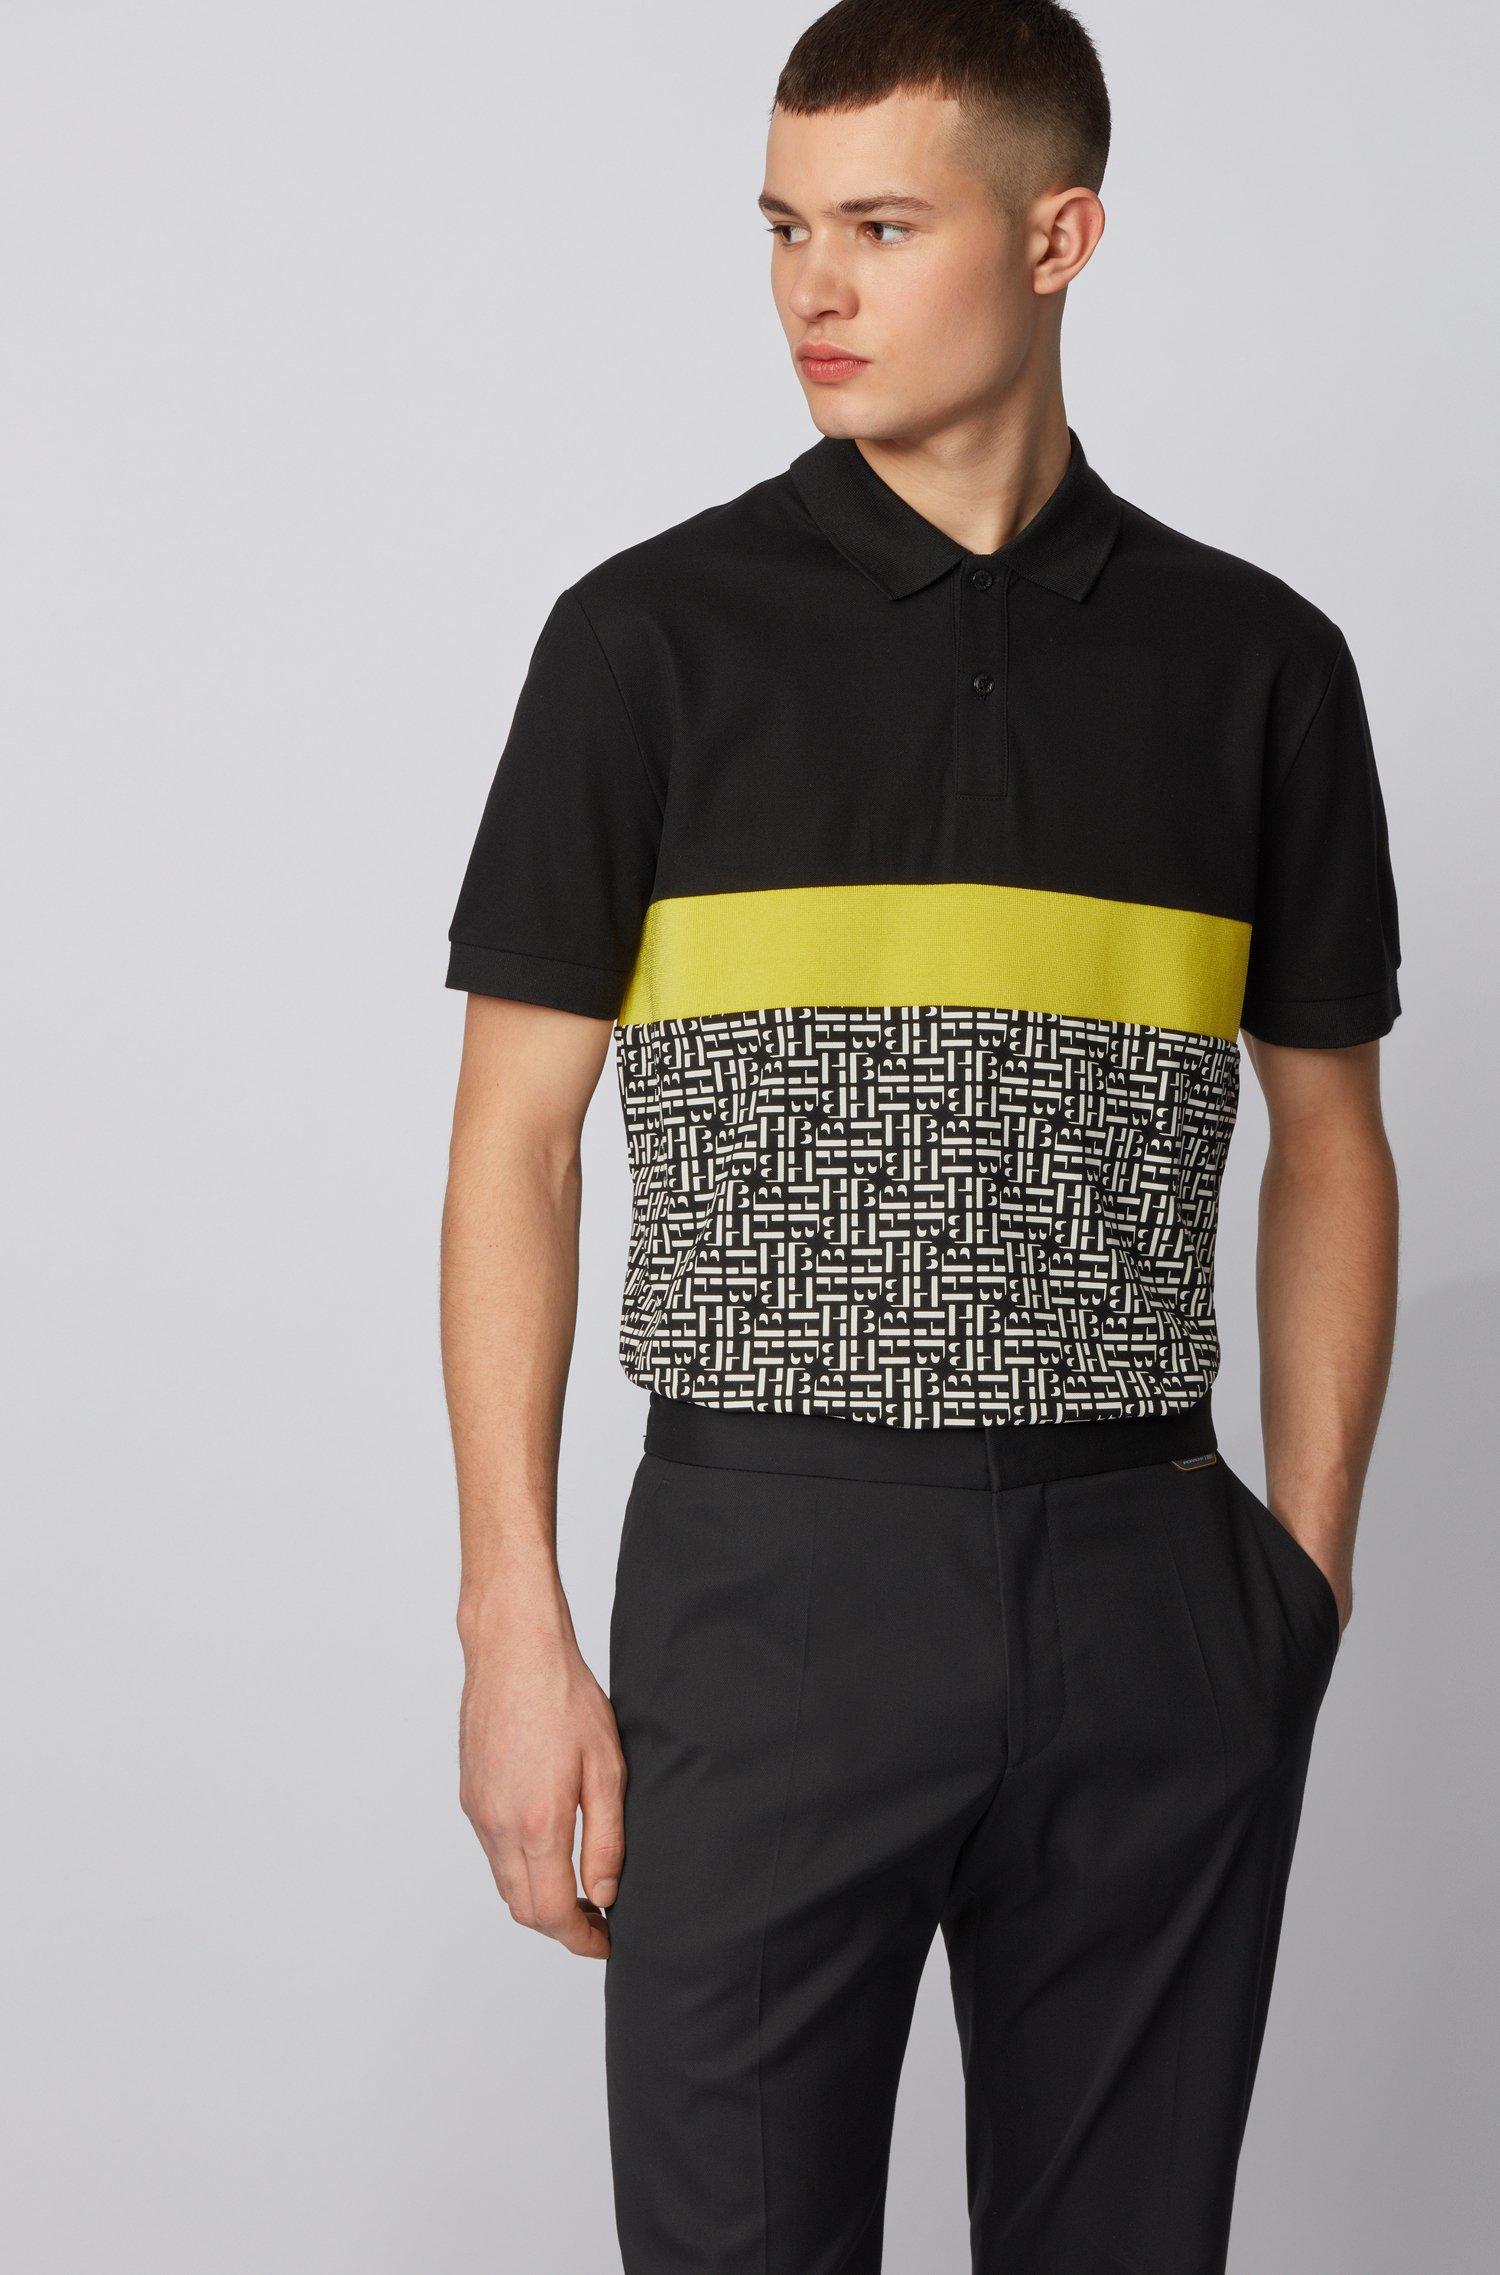 Phillipson Regular-fit cotton polo shirt with monogram panel BOSS | Polo Shirts | 50433415001